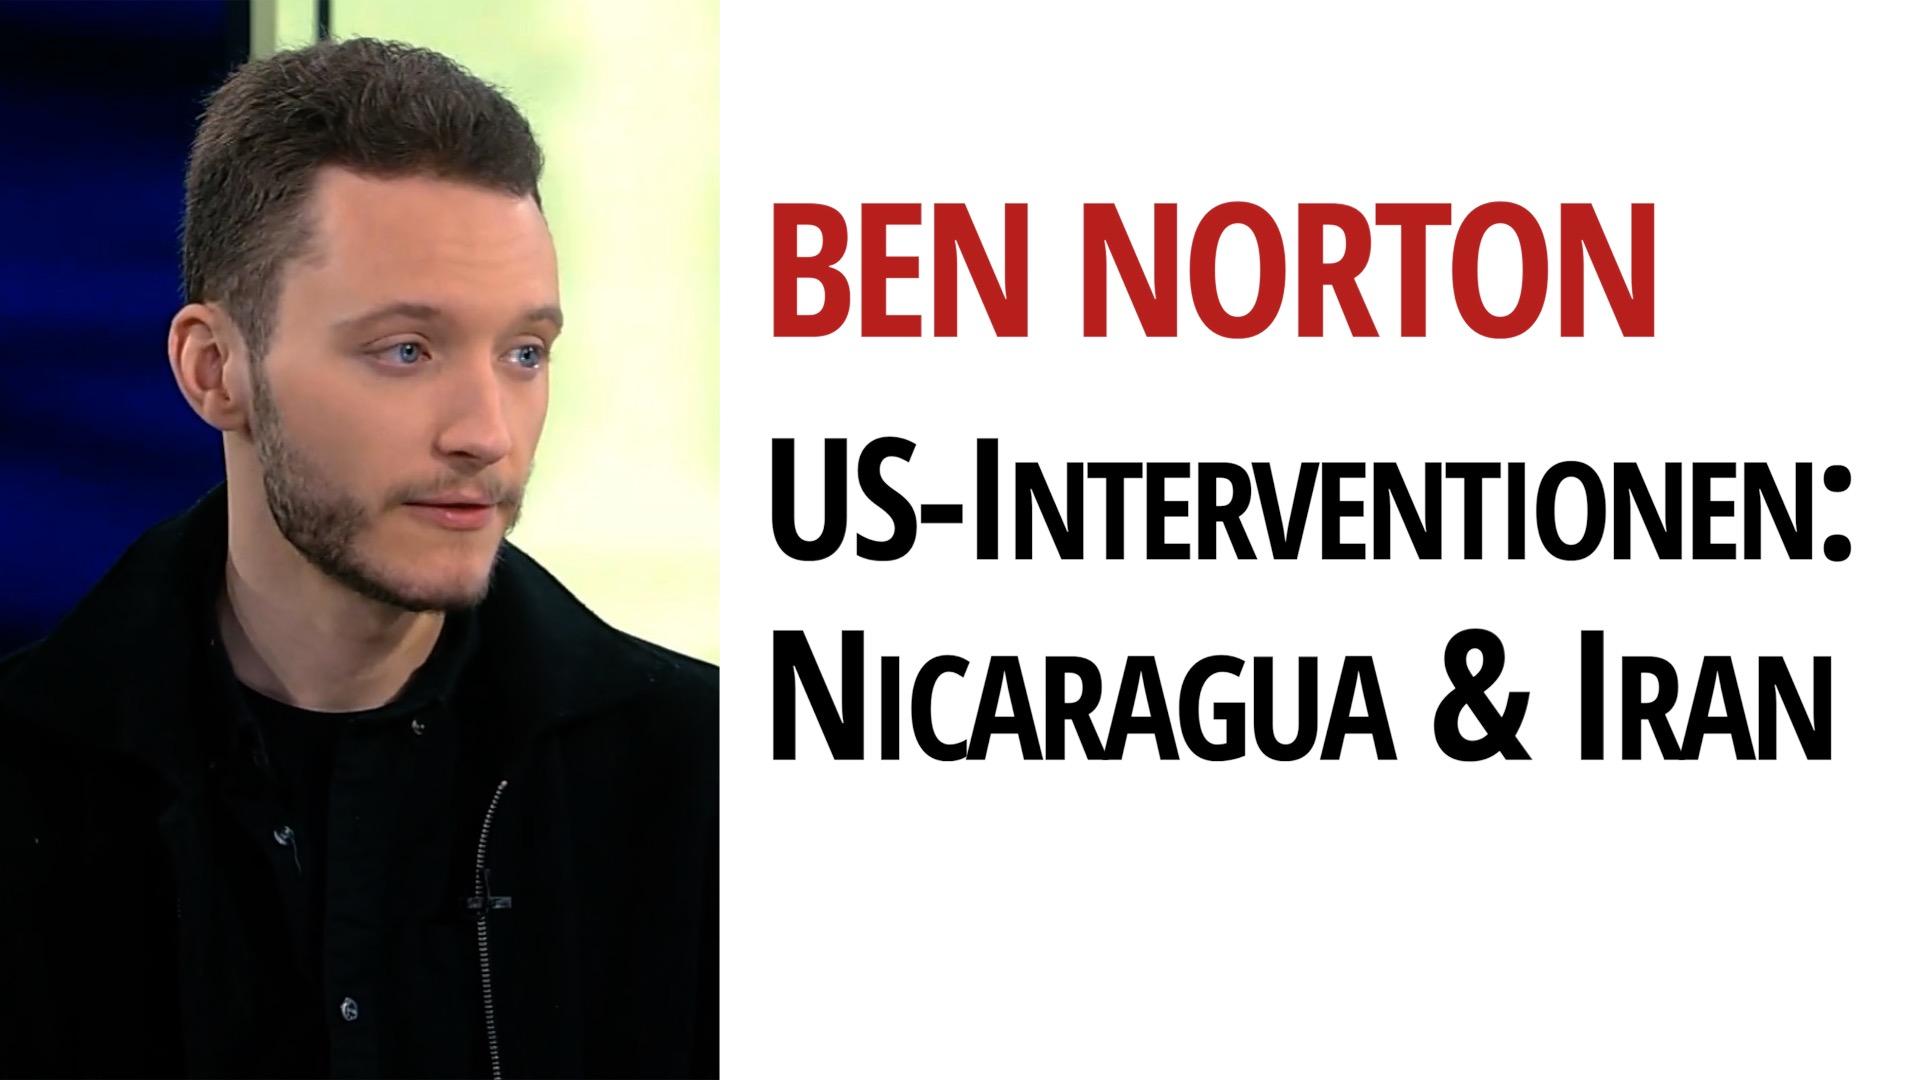 Iran Coronakrise Ben Norton